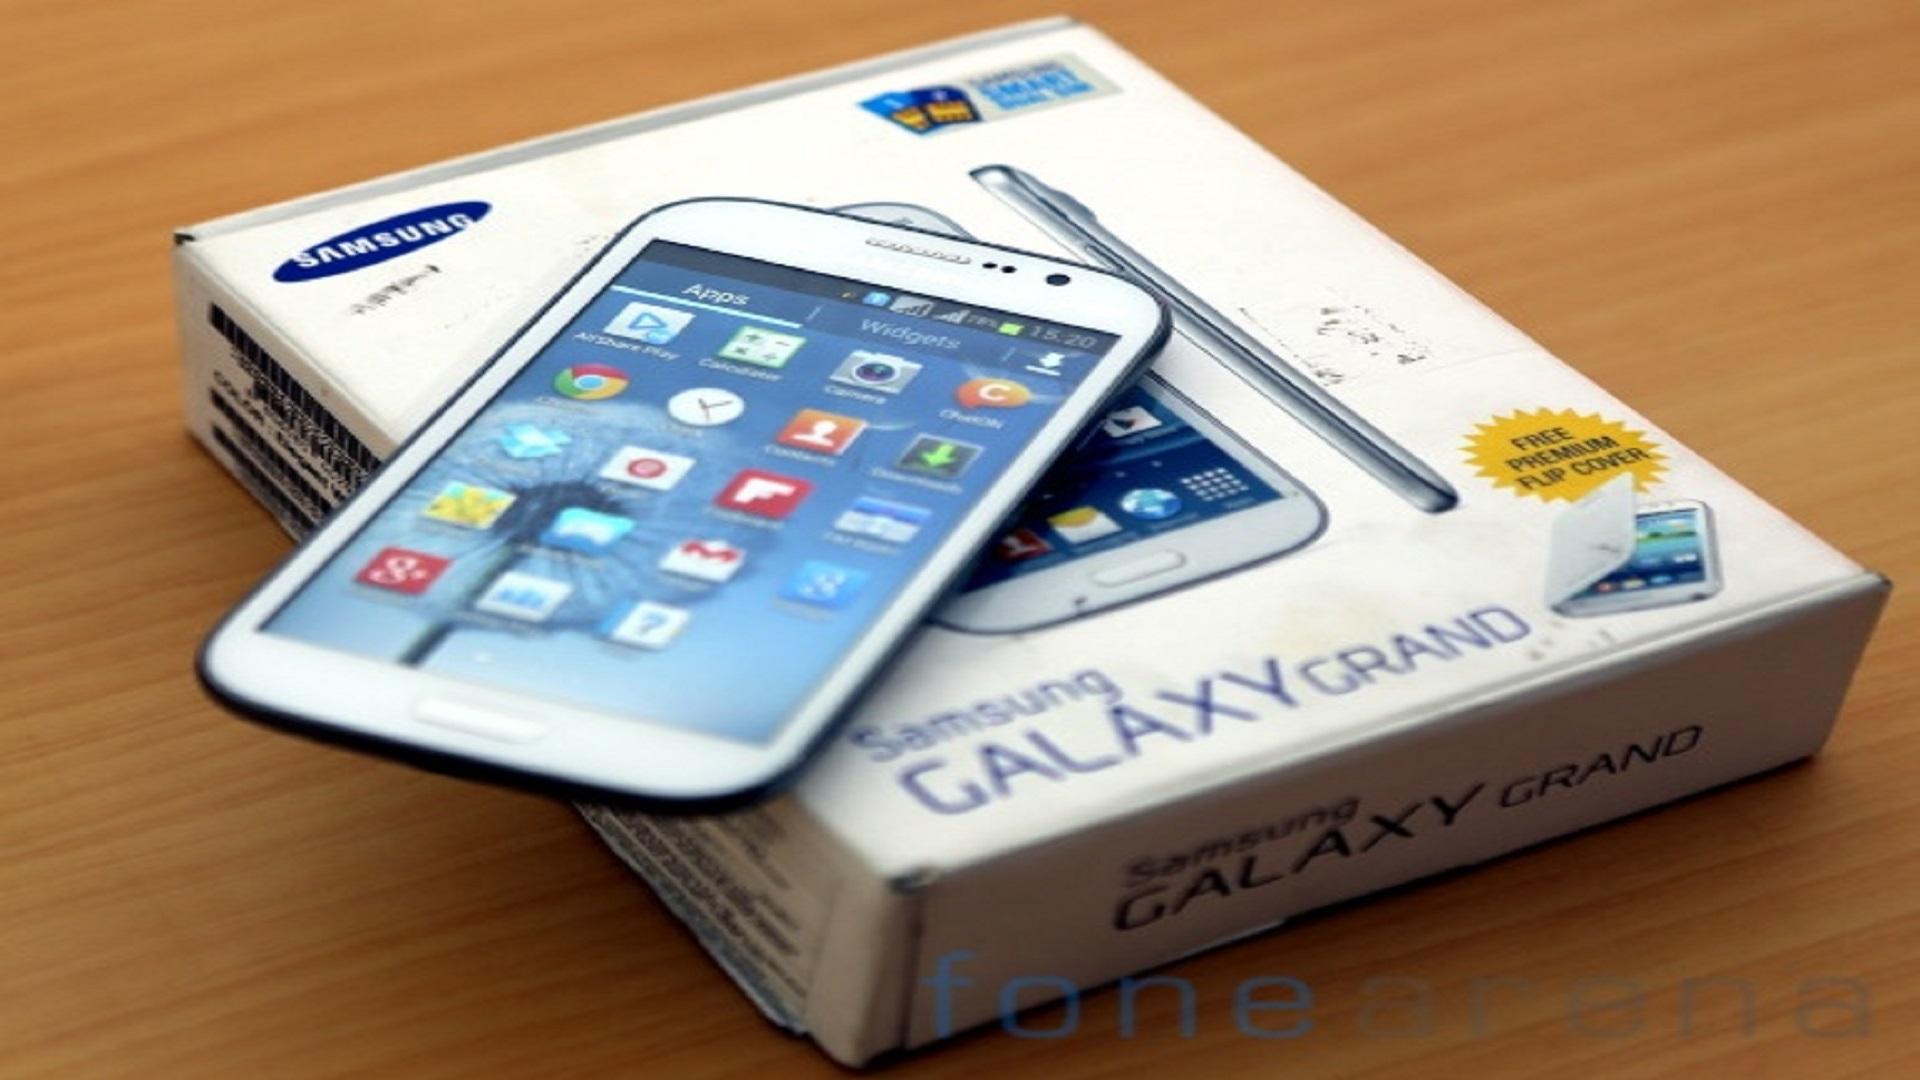 Samsung Galaxy Grand Duos 18 Free Hd Wallpapers Hd Wallpaper